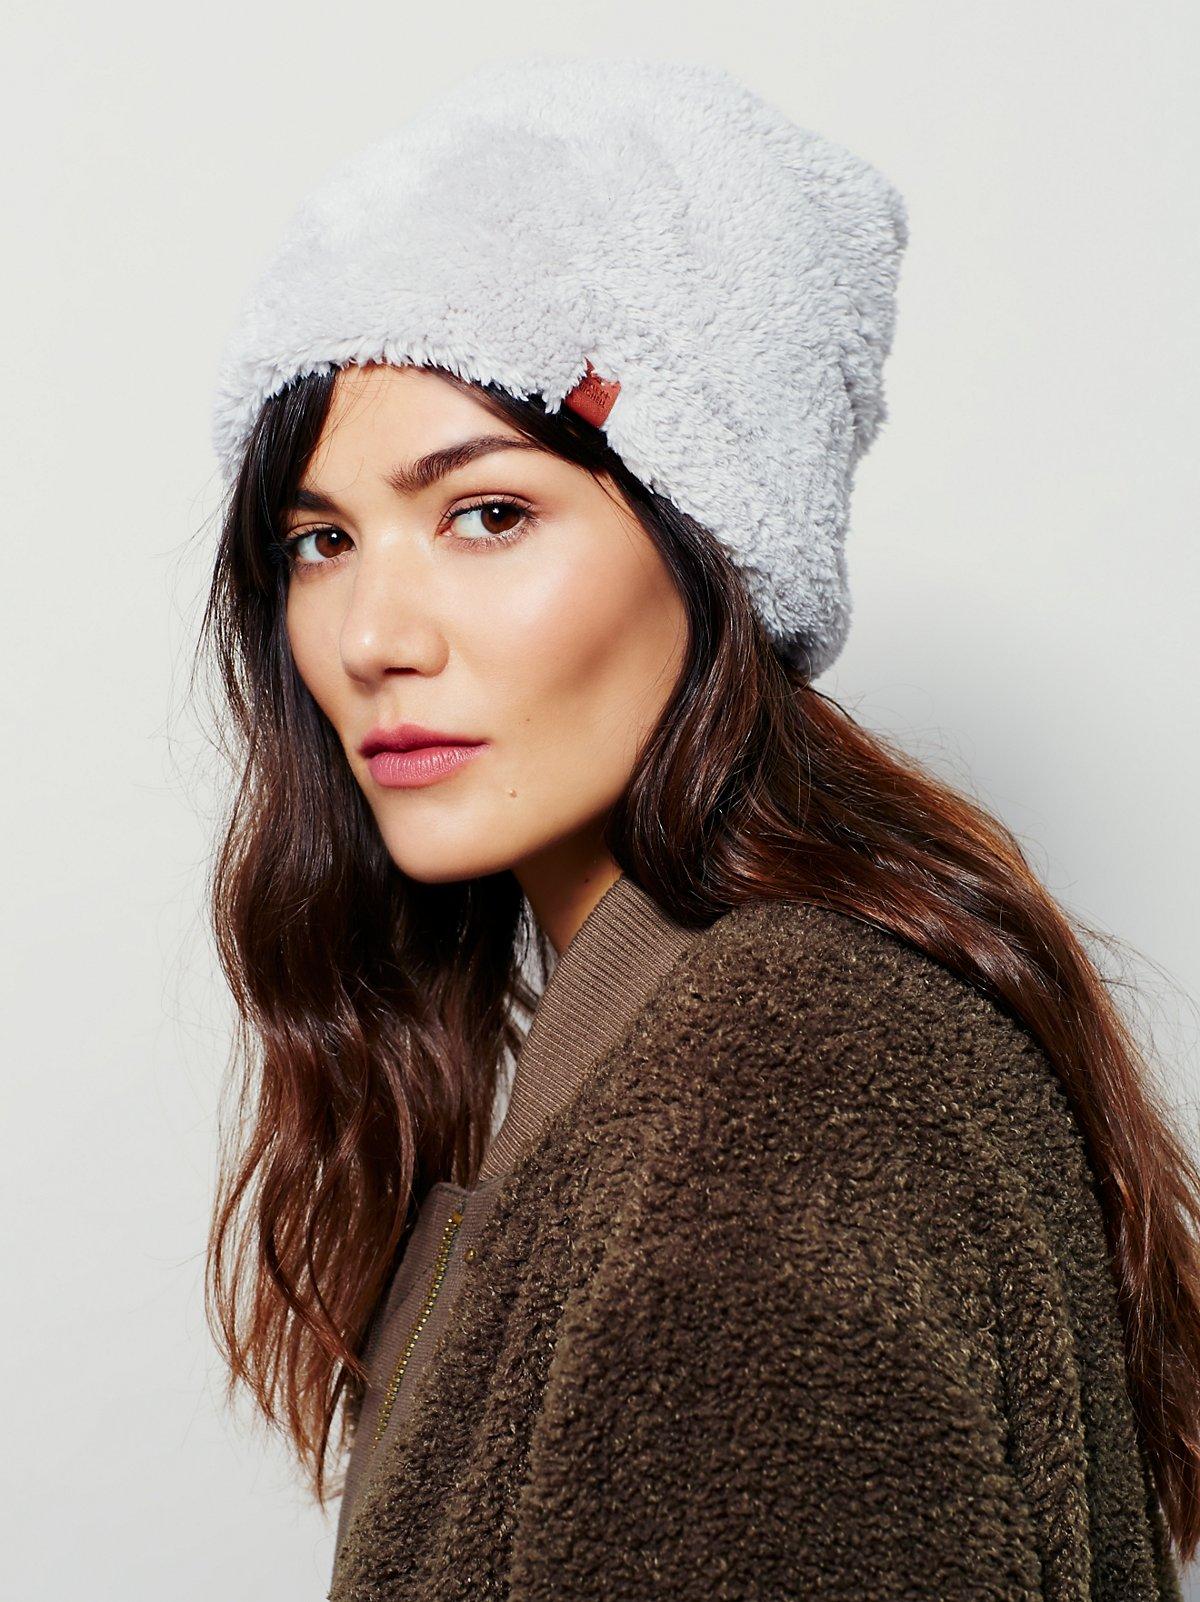 Polar Bear舒适针织帽